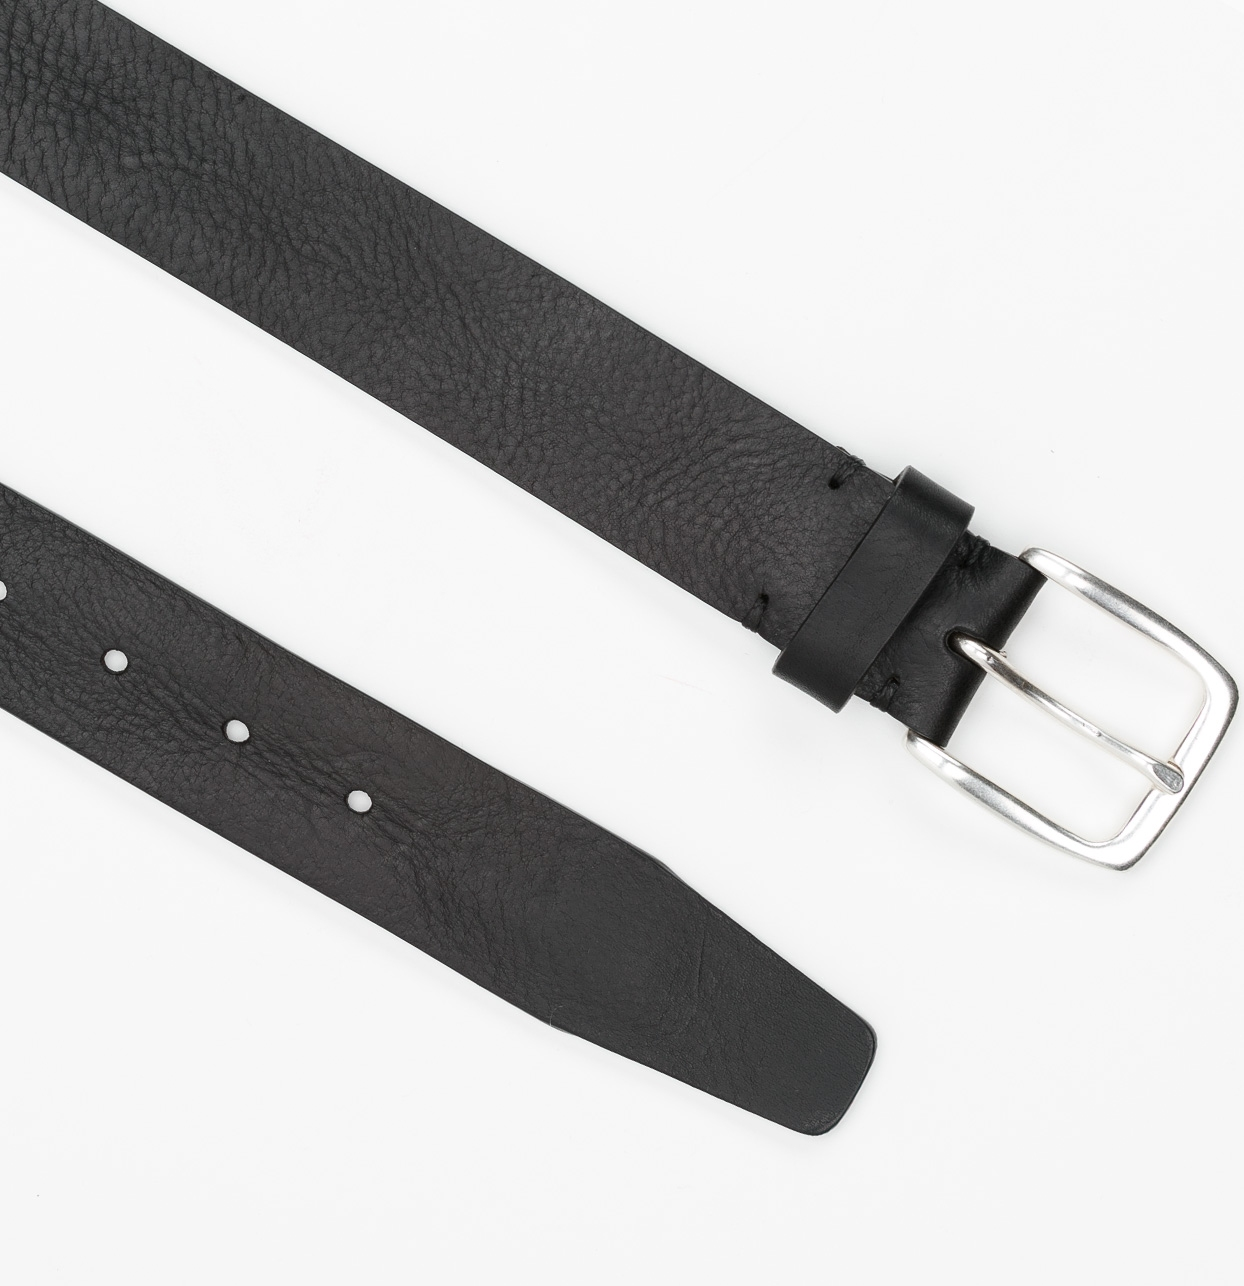 Cinturón Sport piel lisa color negro, 100% piel - Ítem3